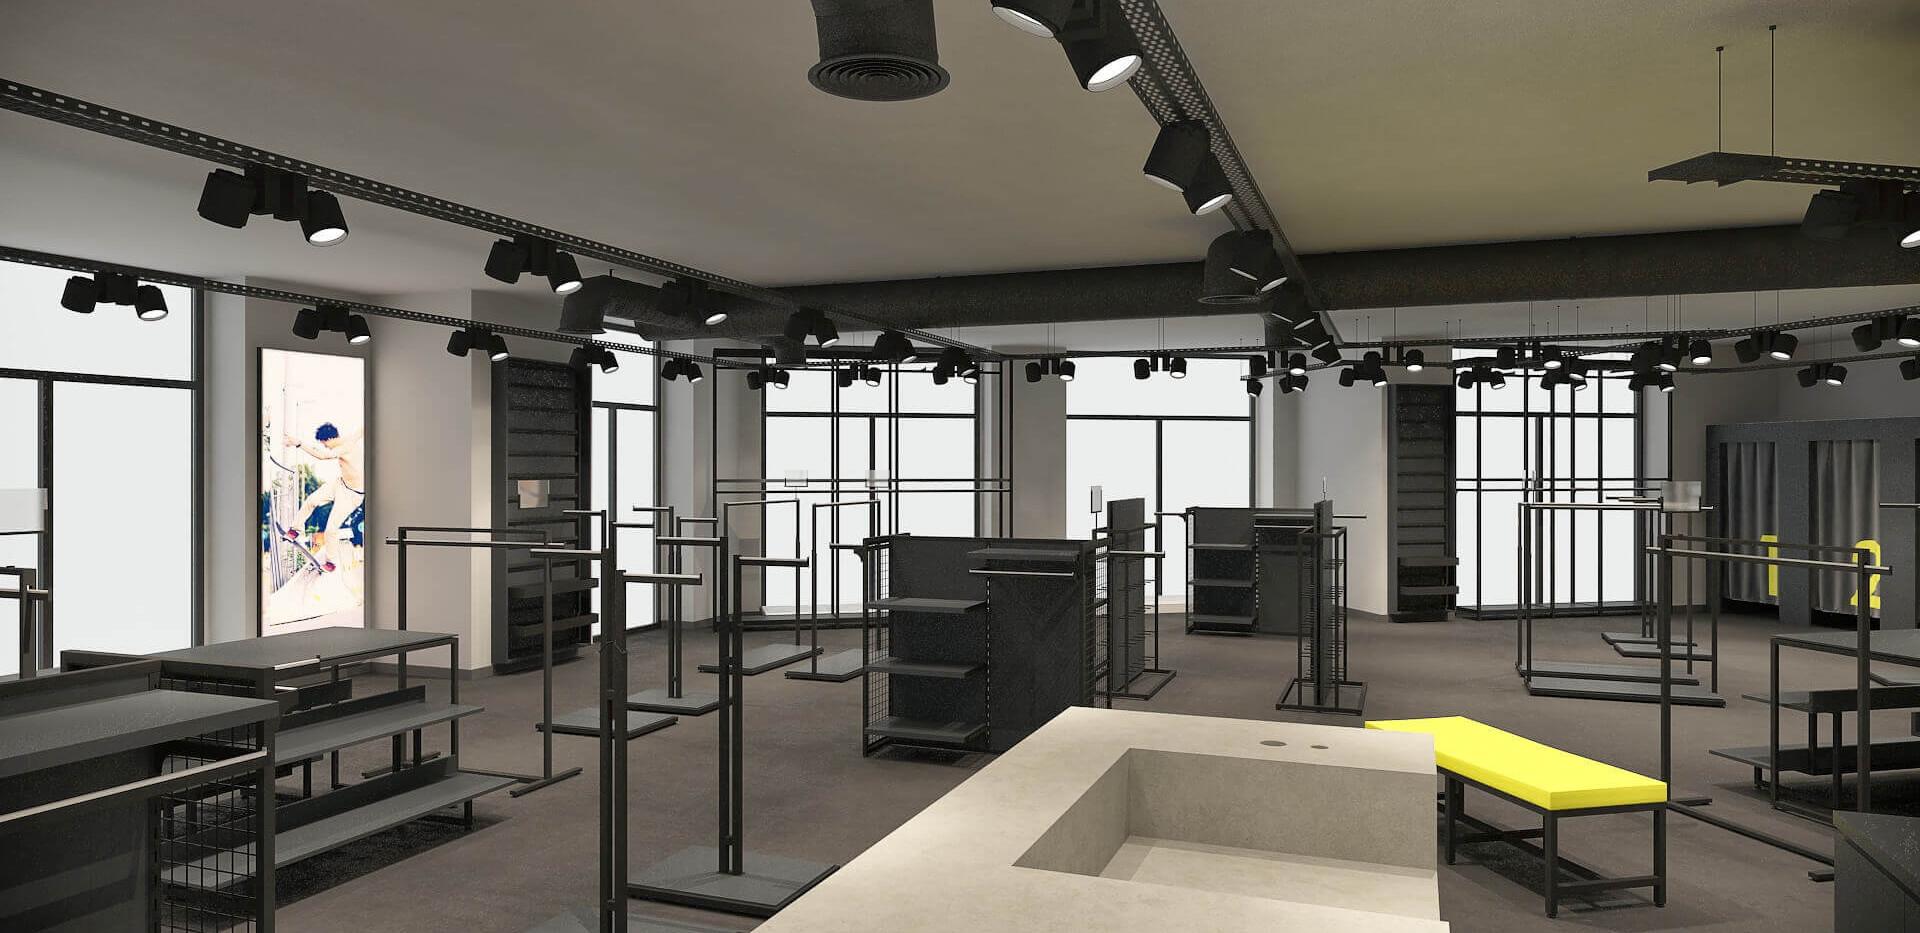 Team Sport - Sports Store Shop Design-6.